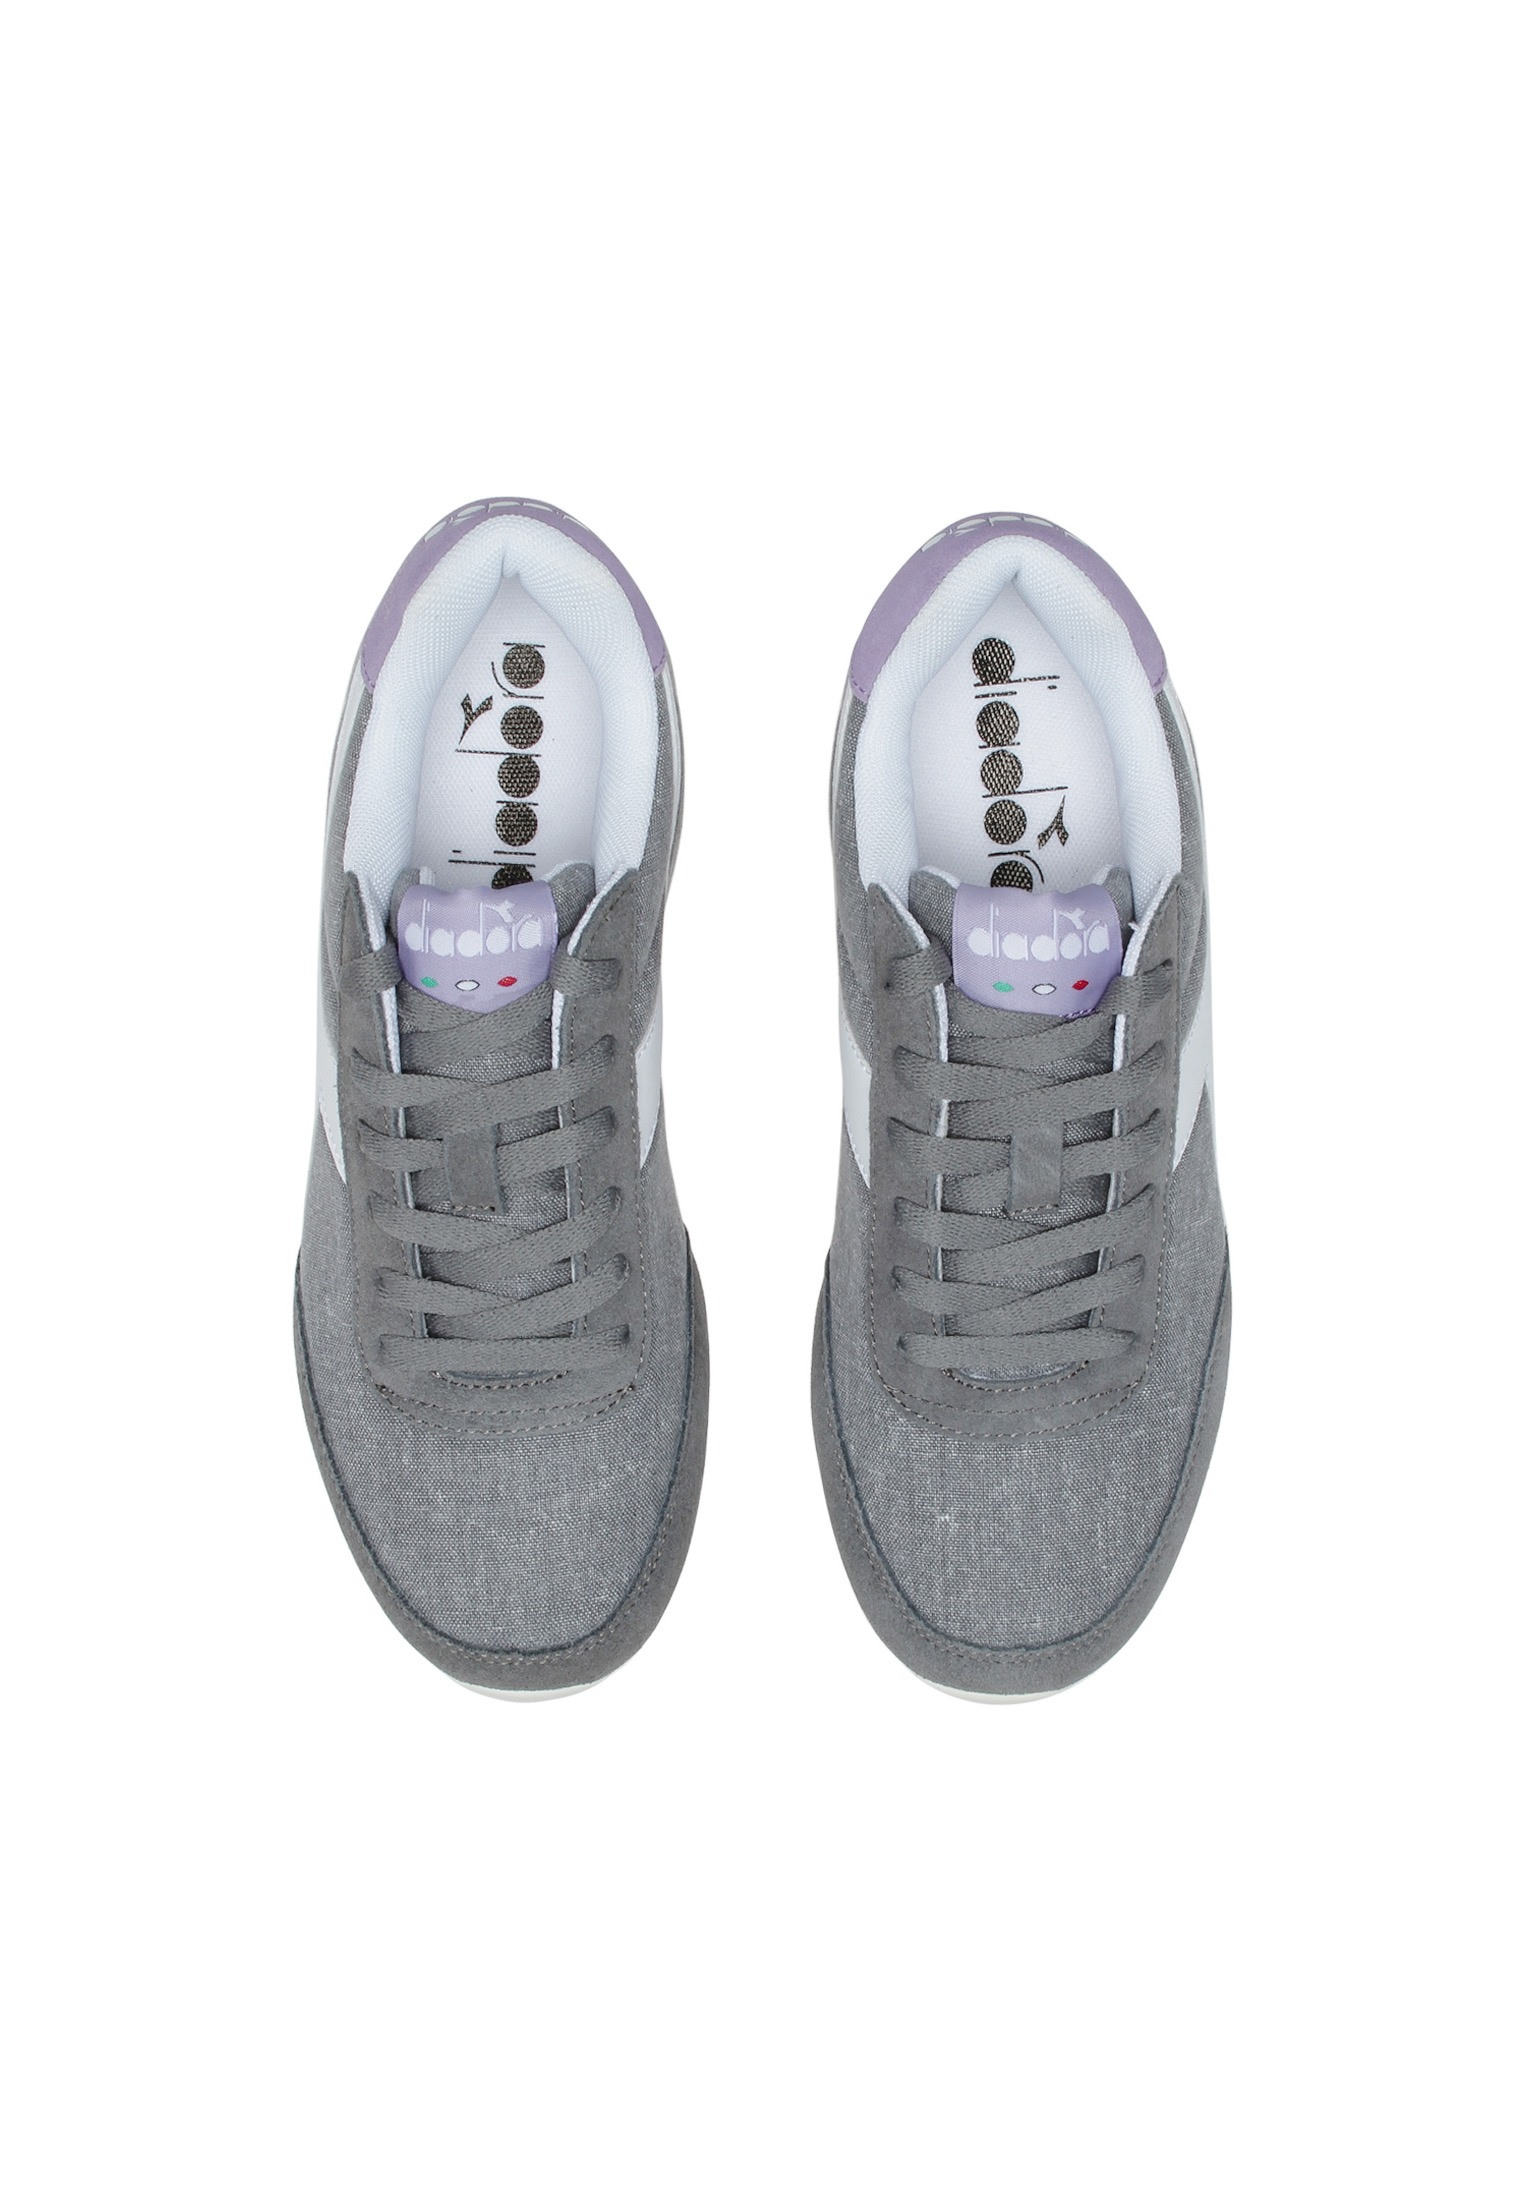 Scarpe-Diadora-Jog-Light-C-Sneakers-sportive-uomo-donna-vari-colori-e-taglie miniatura 84